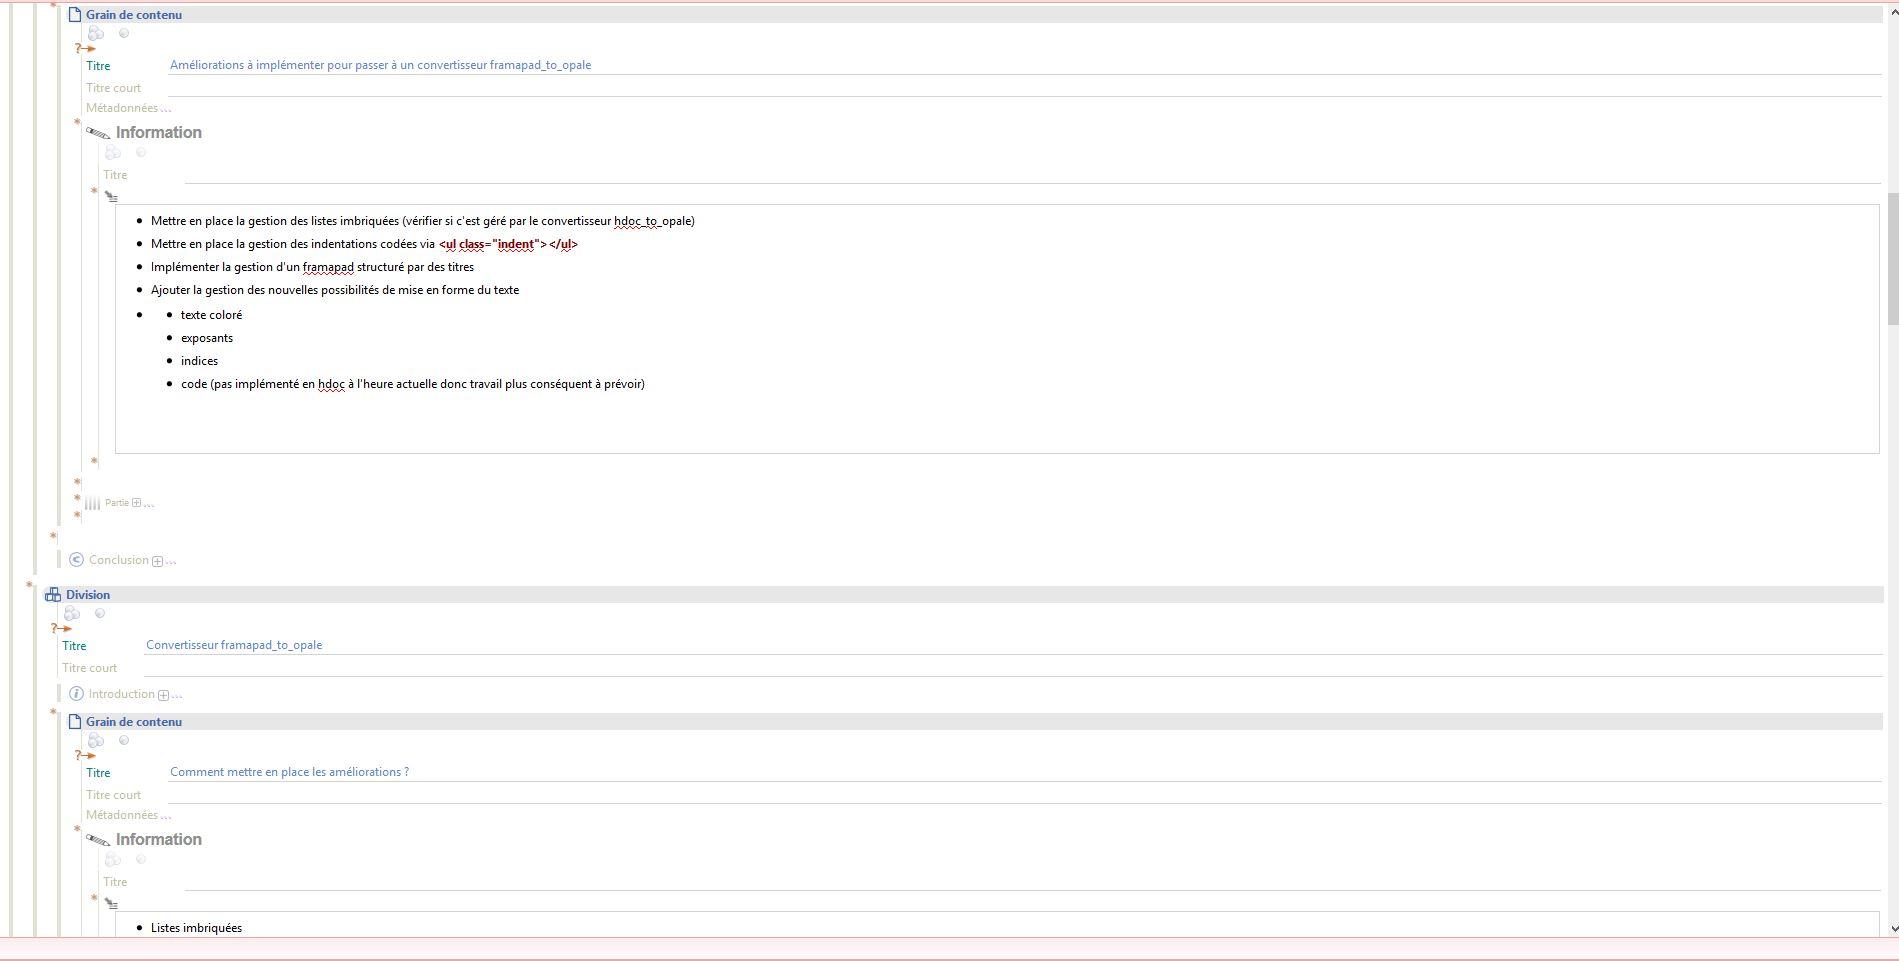 framapad_to_opale/sample/resultOpale2.JPG